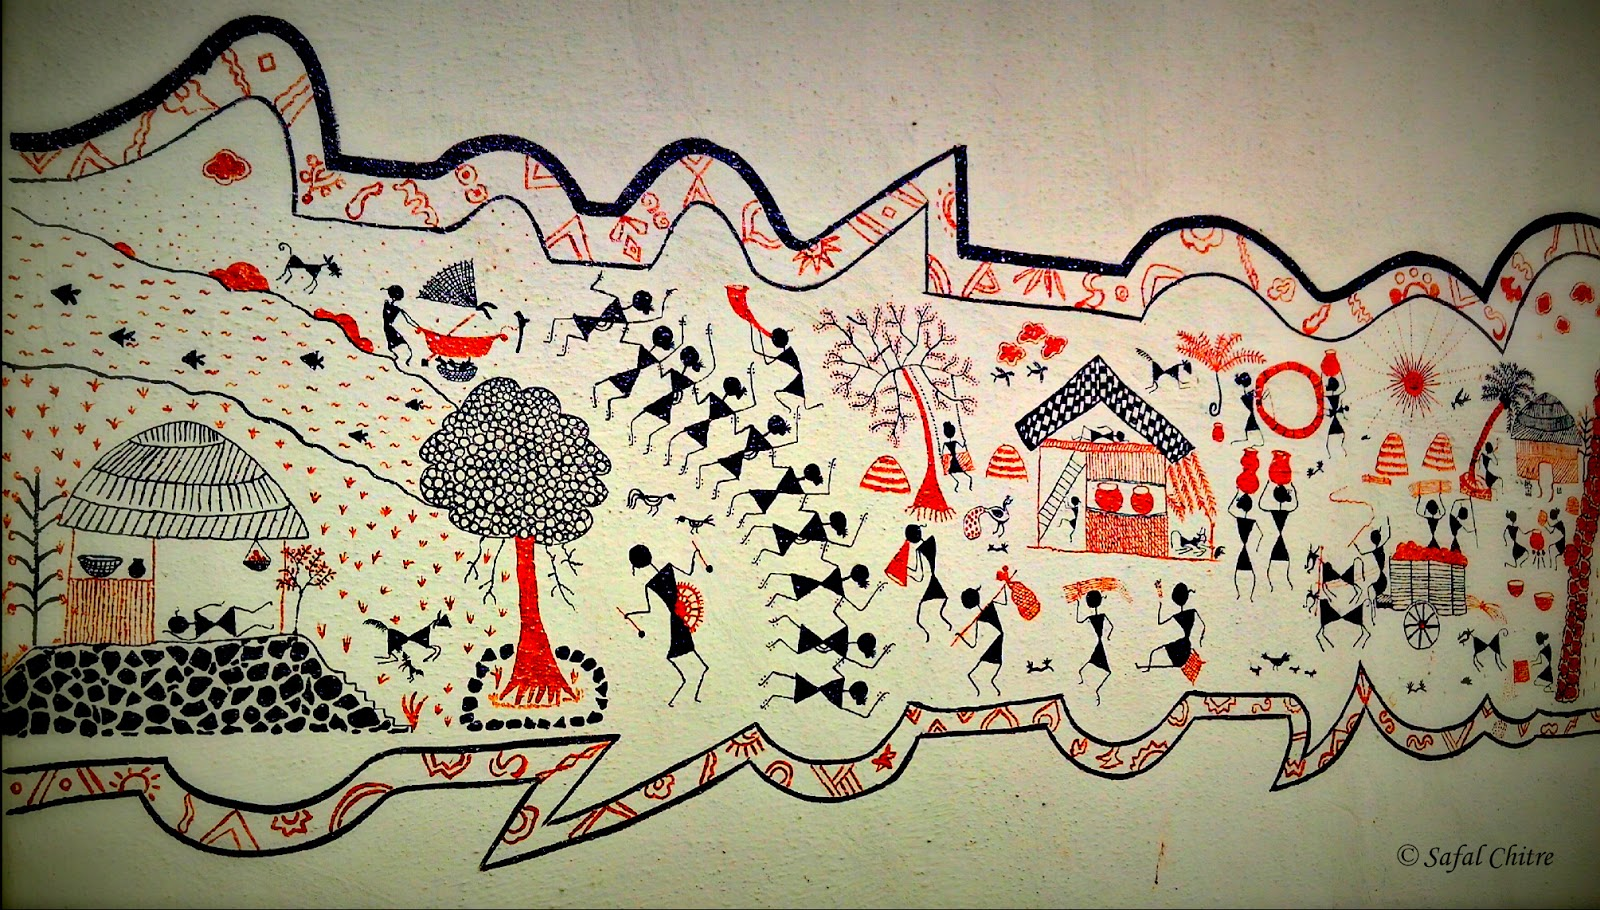 SAJAVAT: Safal Chitre - A talented Warli Artist